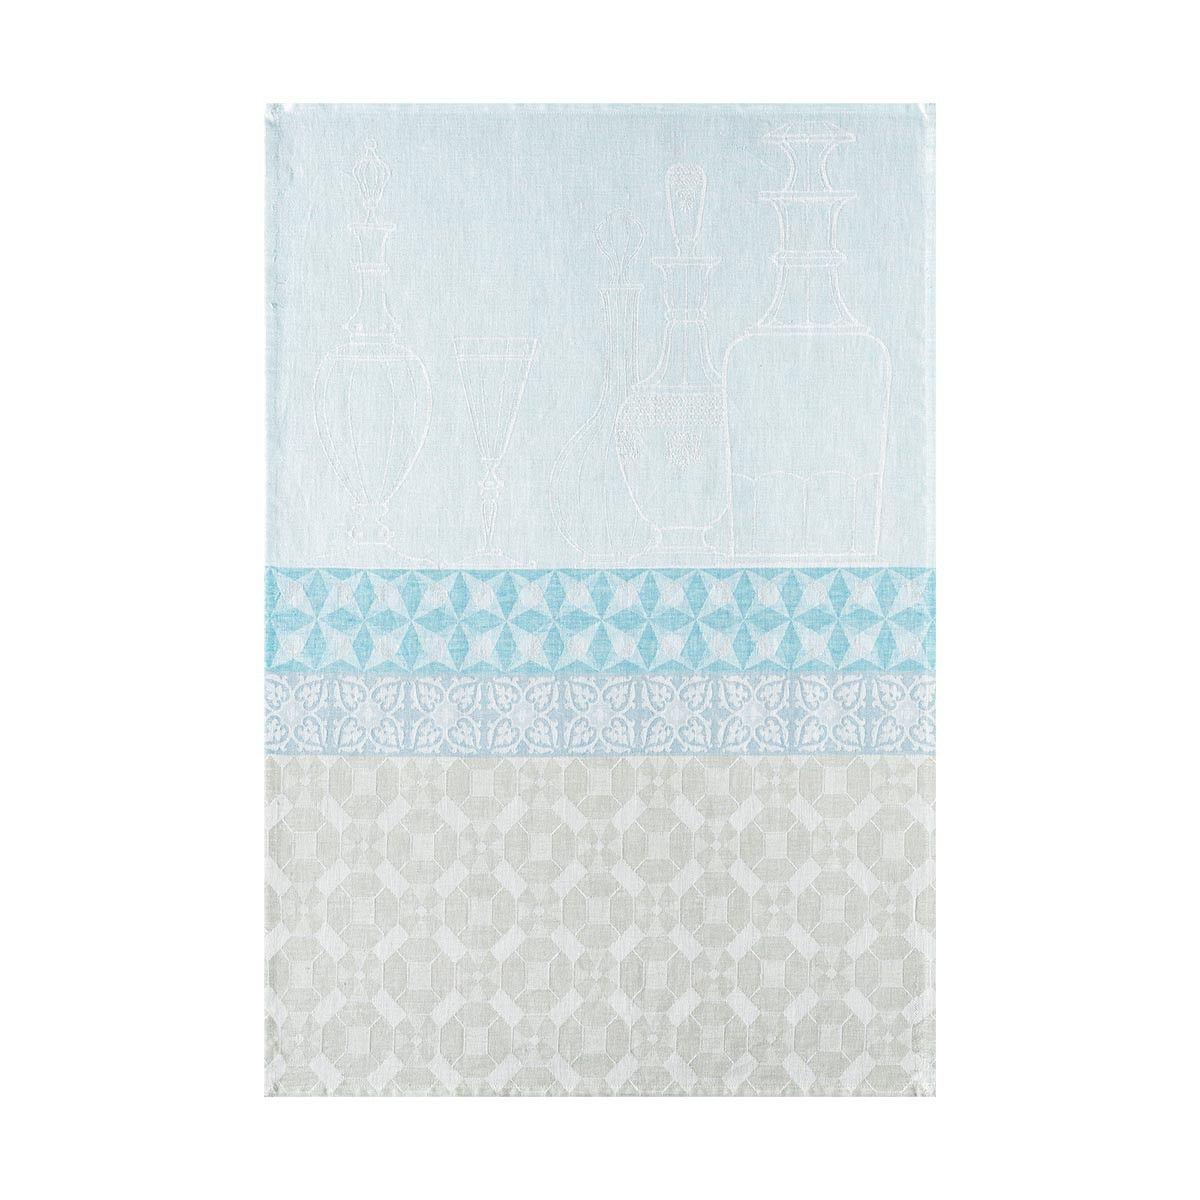 "Tea towel Transparence Blue aqua 60x80 / 24""x31"" 100% linen - Tea towel - Kitchen Linen - Le Jacquard Français"